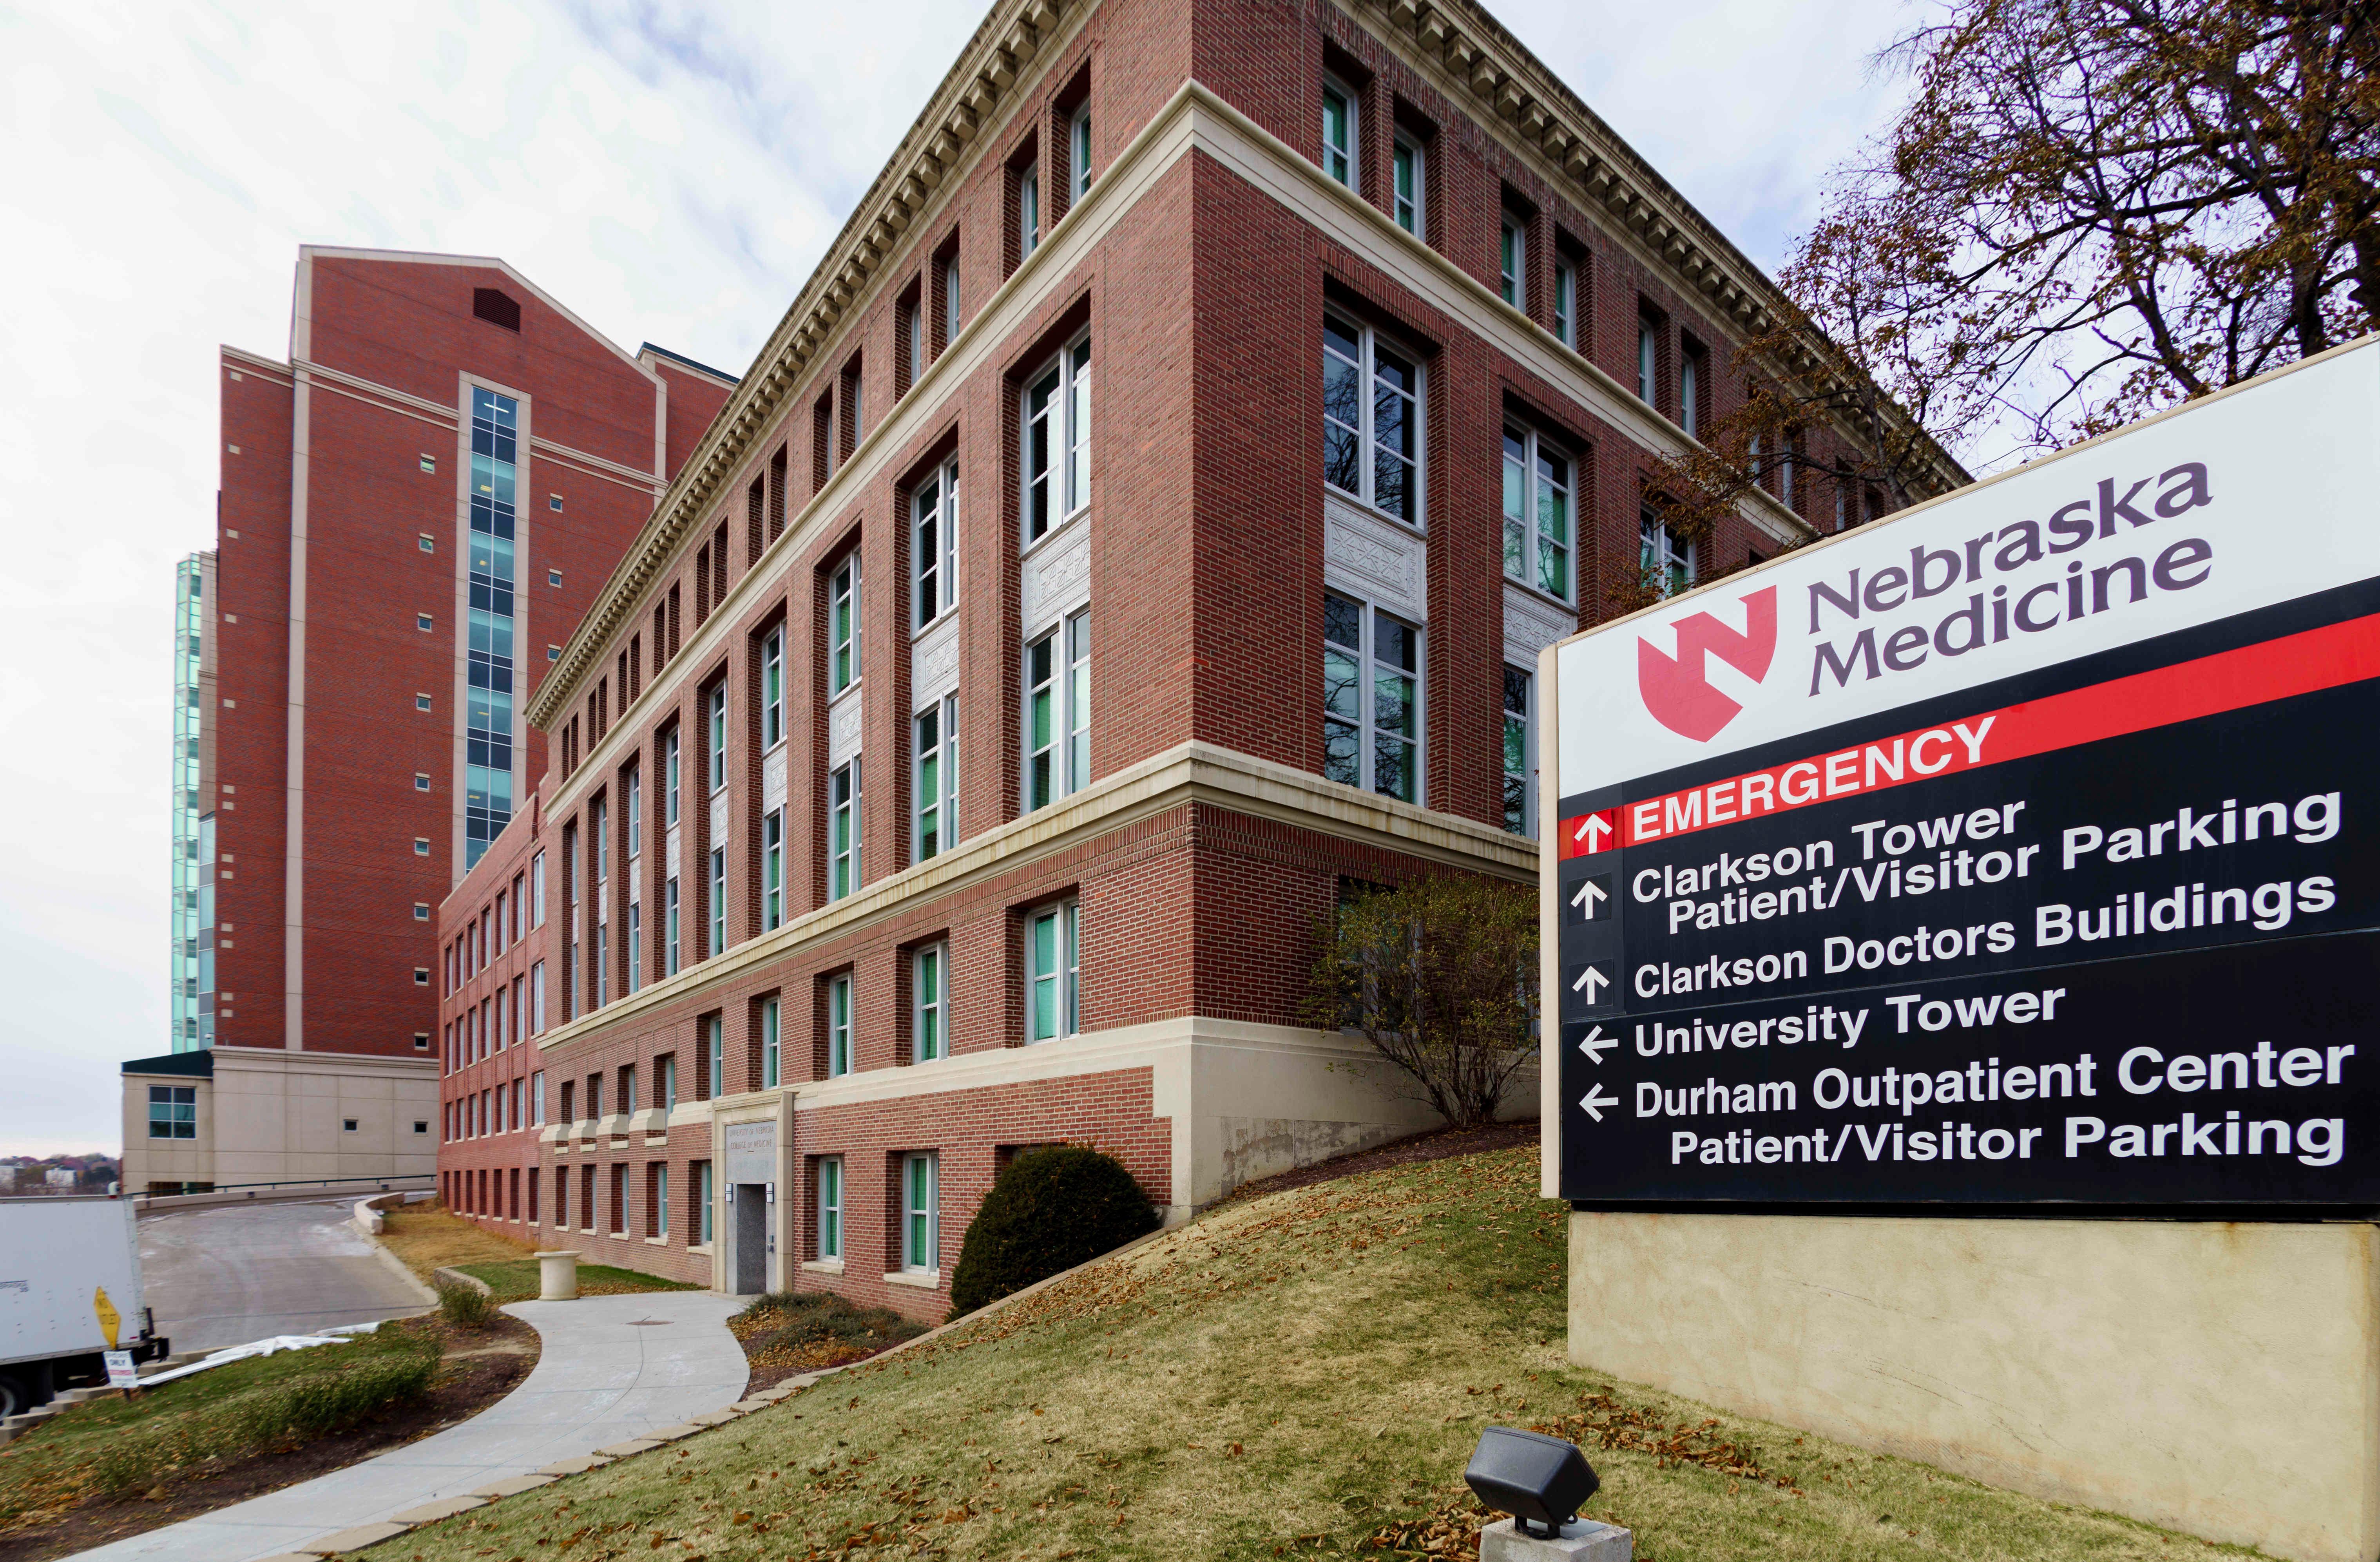 This photo shows the Nebraska Medical Center is Omaha, Neb. on Nov. 14, 2014.